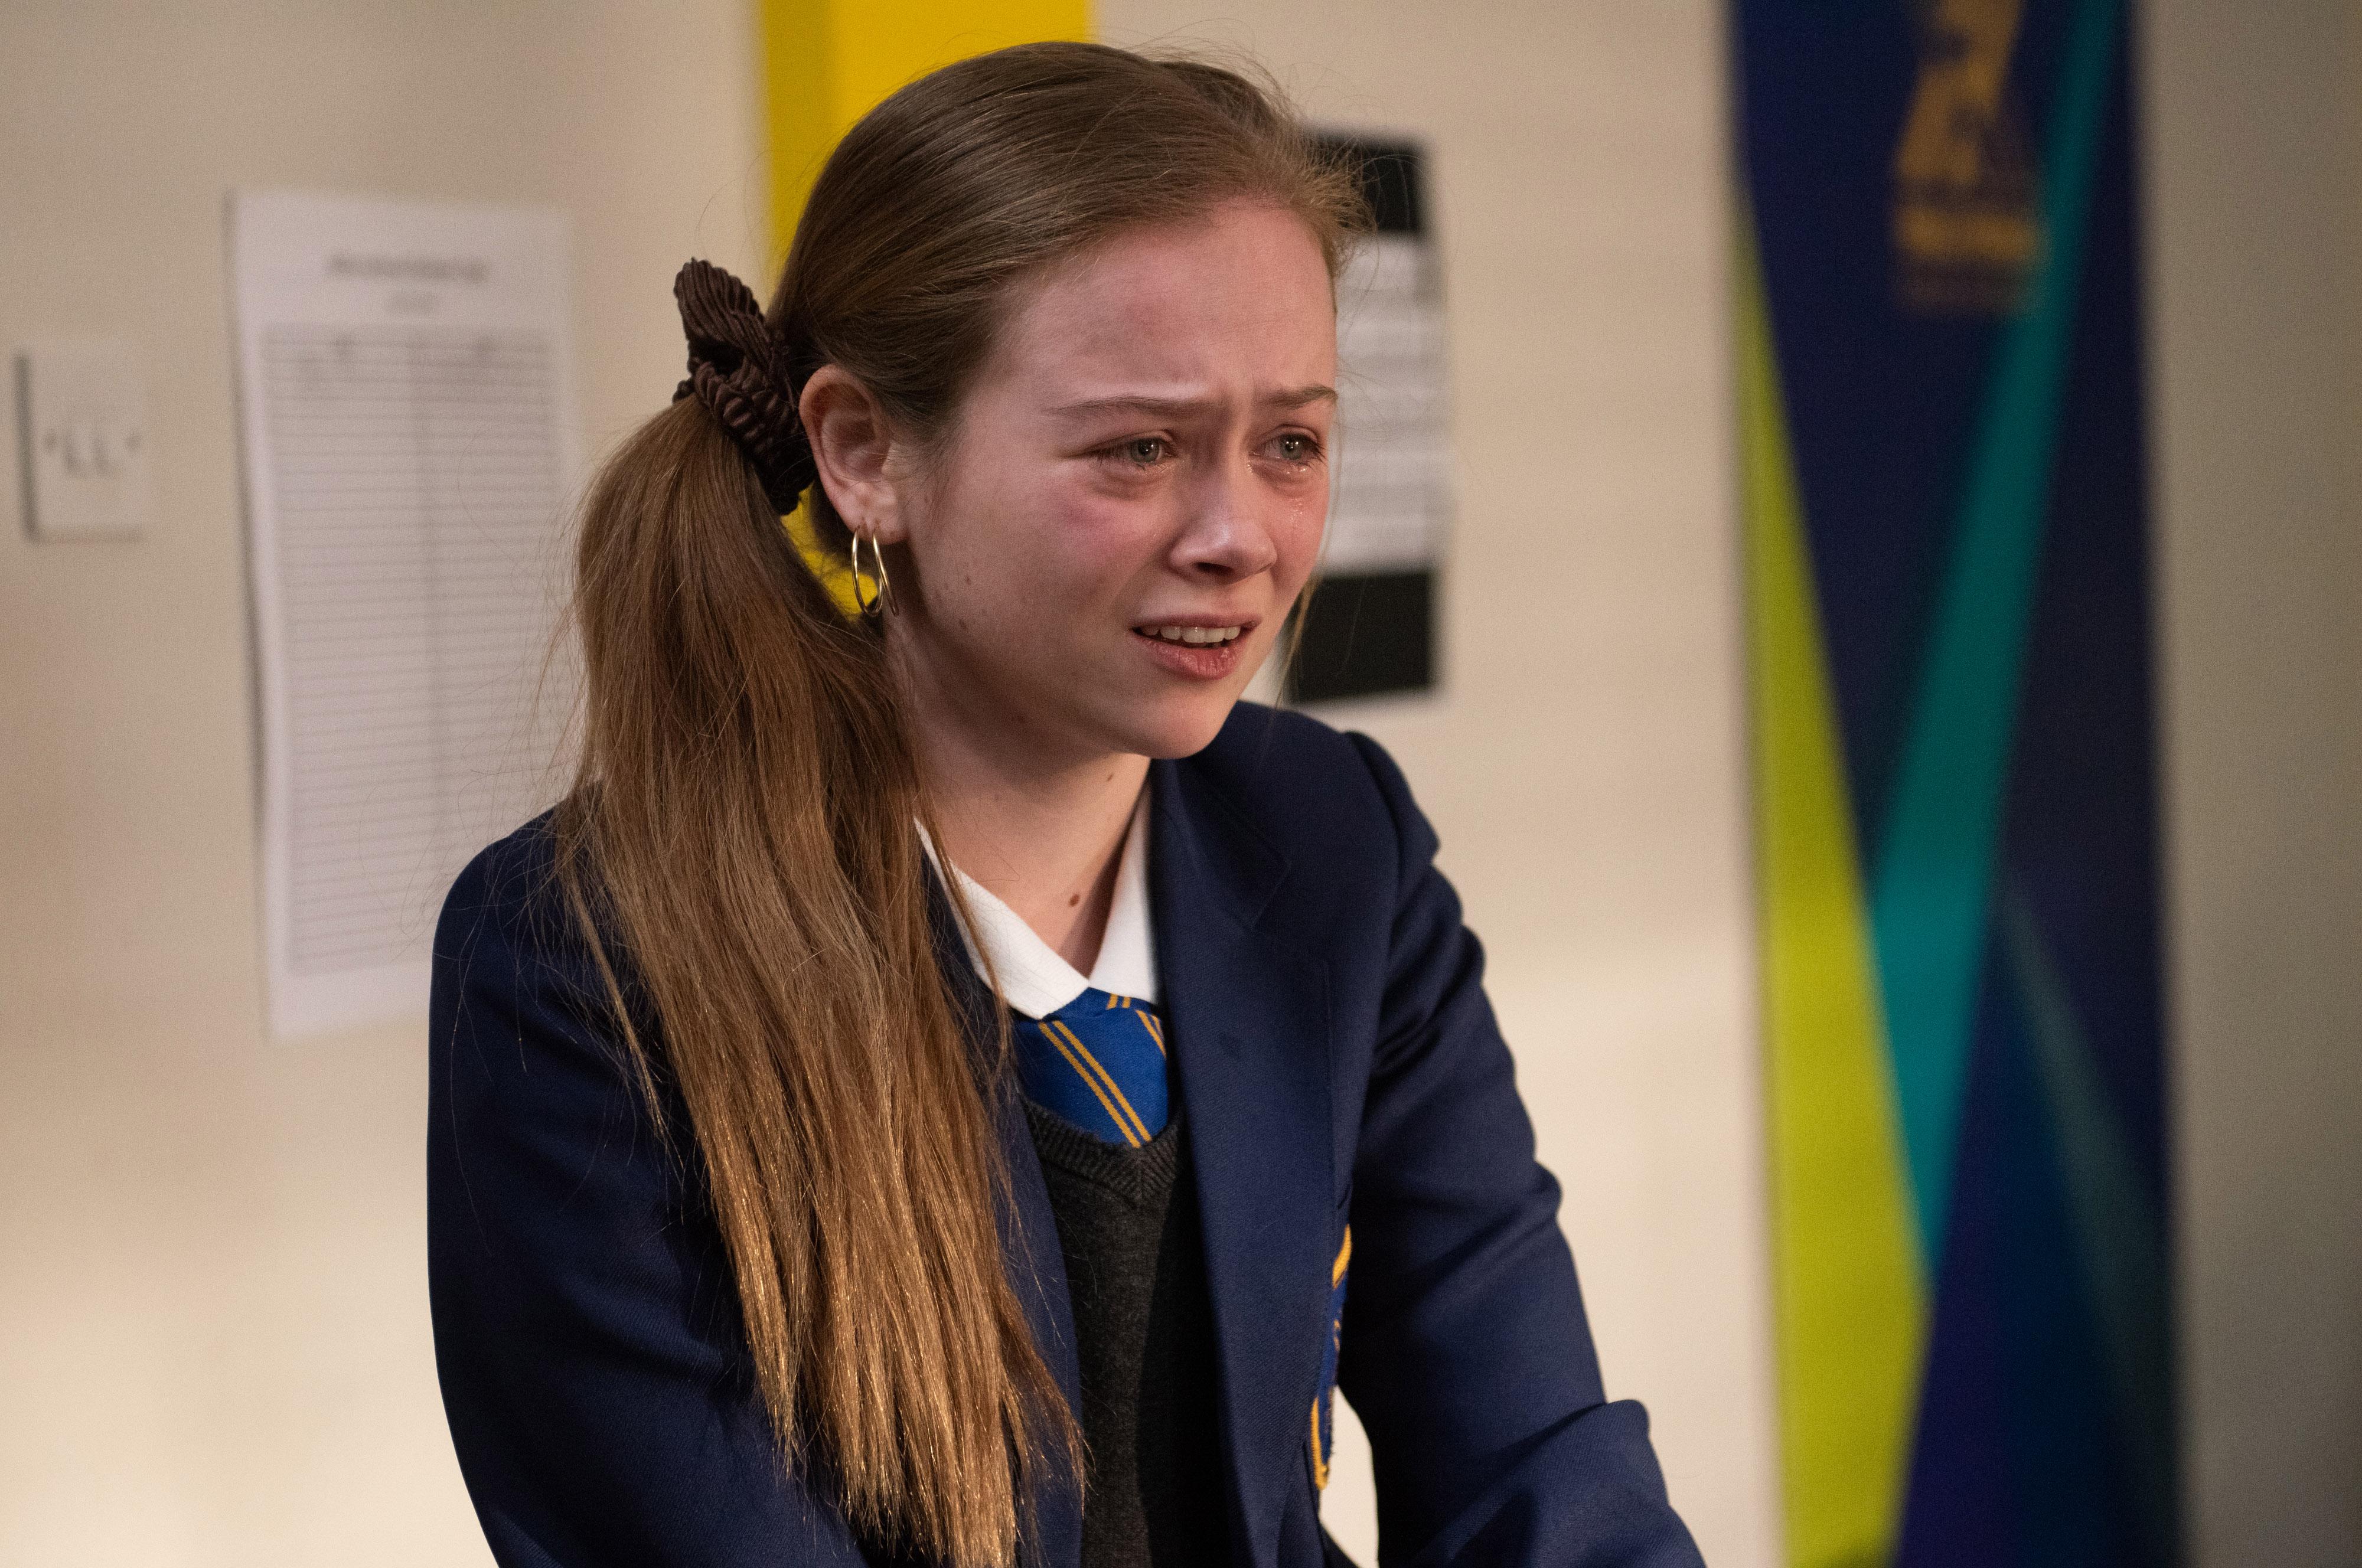 Hollyoaks spoilers: Scandal as schoolgirl Juliet Quinn reveals her love for Darren Osborne